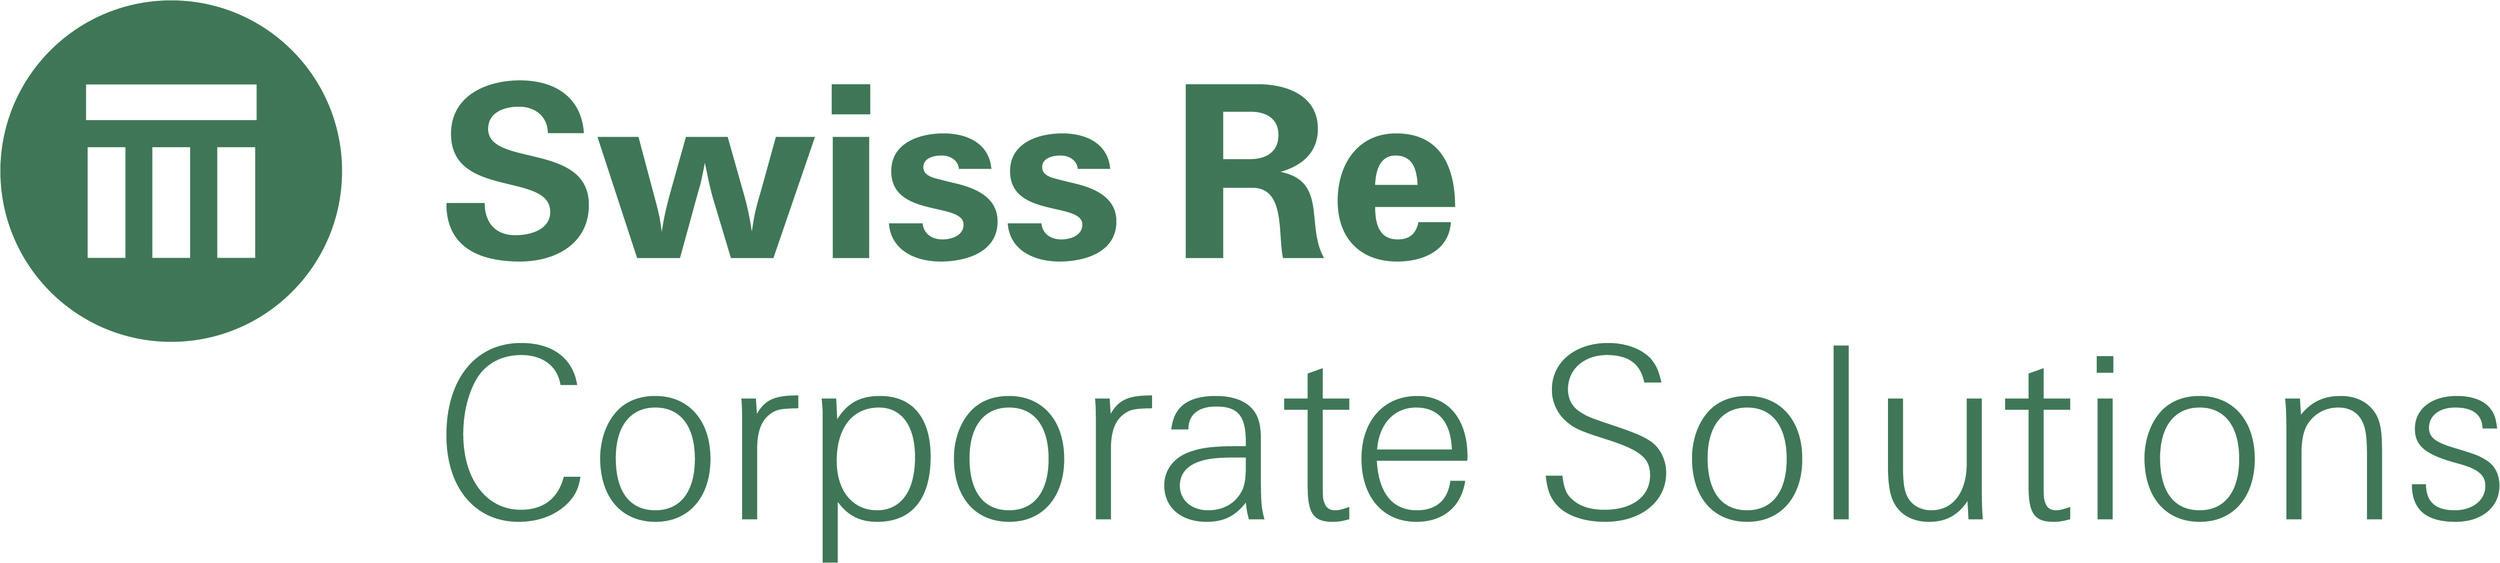 swiss rw corporate solutions logo.jpg